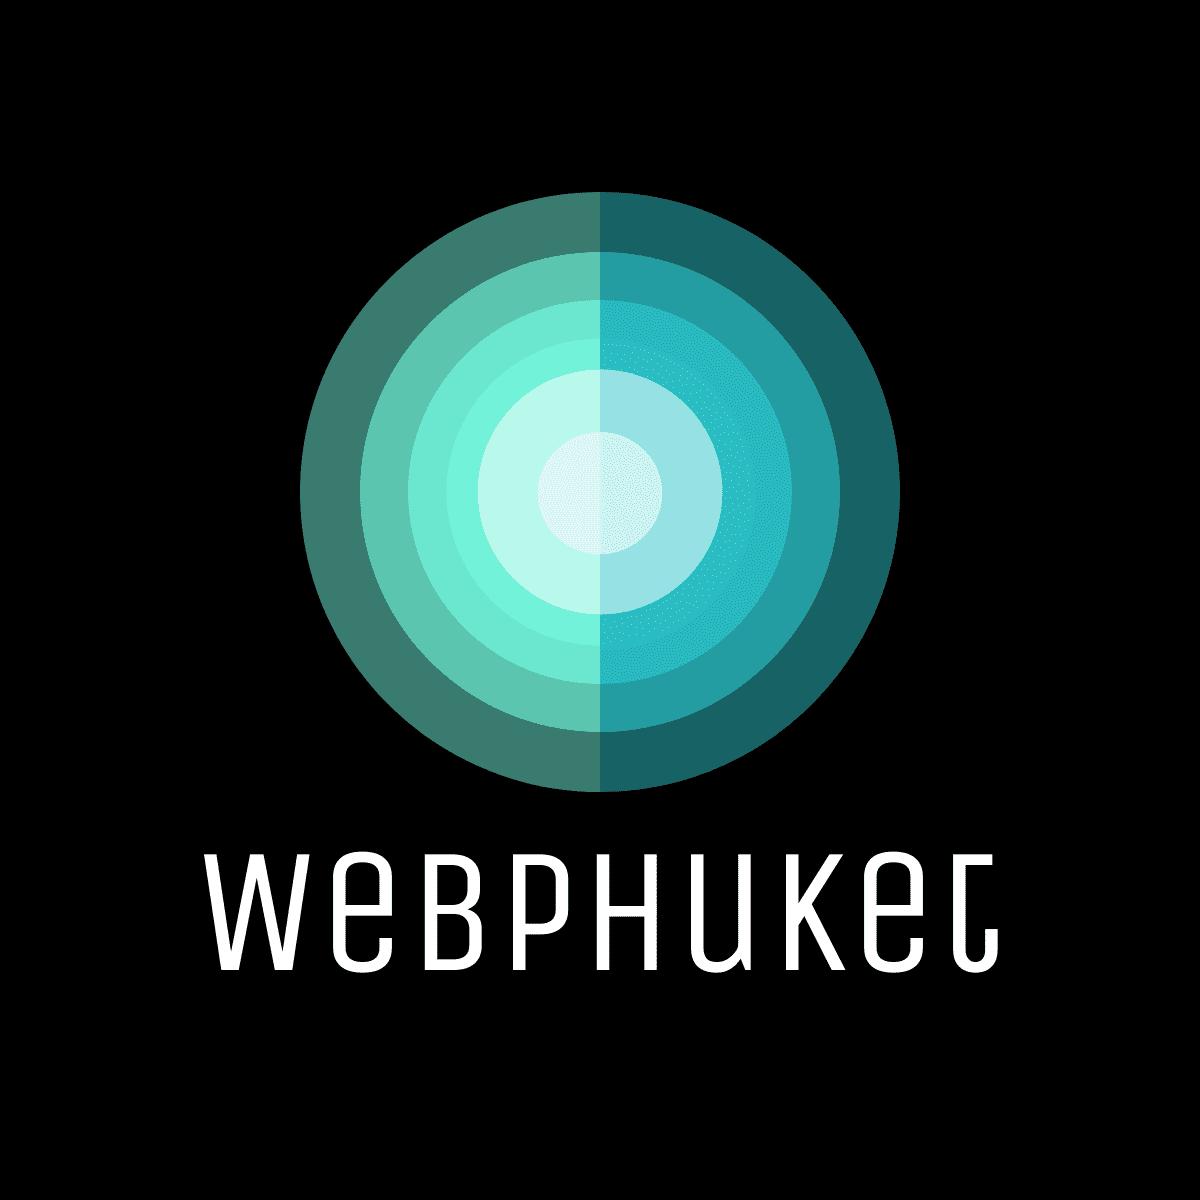 WebPhuket